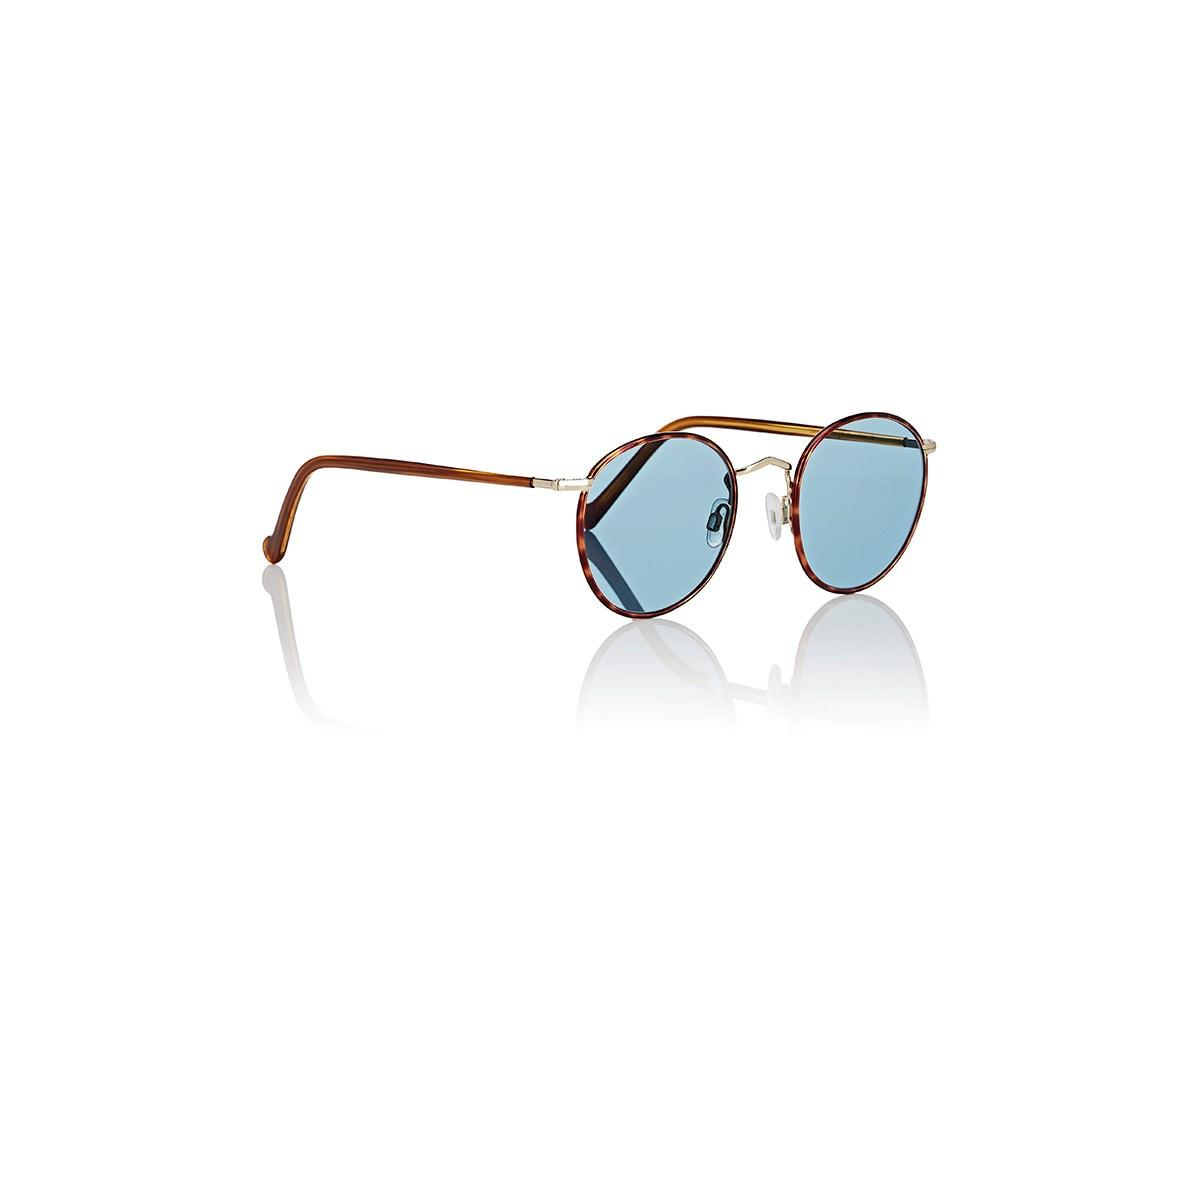 75988dfe753df ... Zev Sunglasses for Men - Lyst. View fullscreen